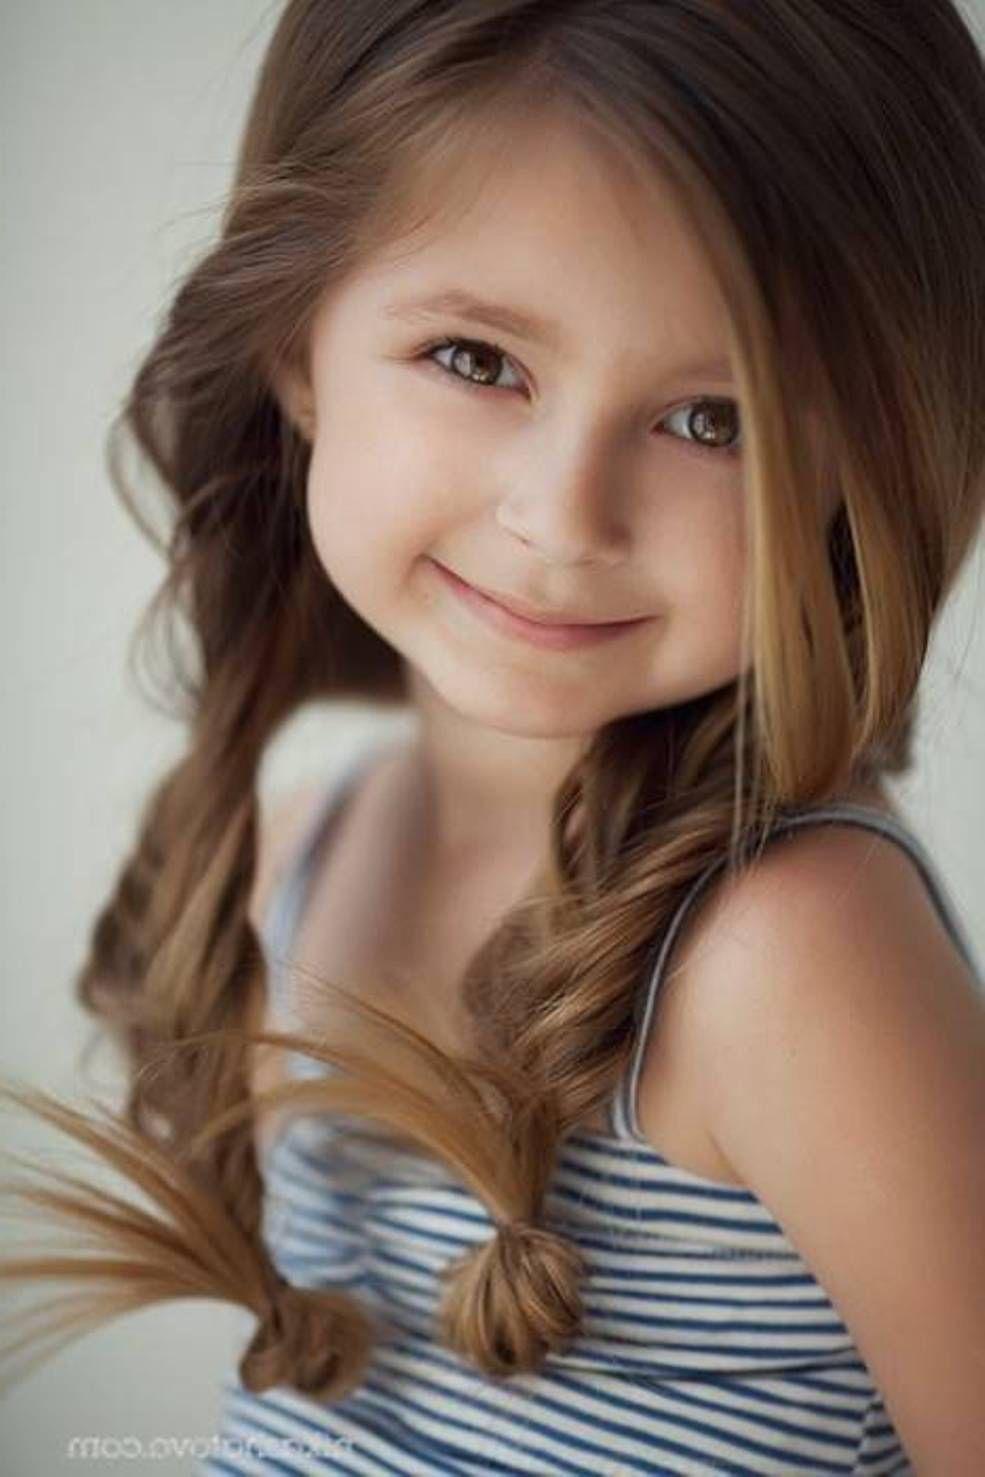 Imagen de http://vistaarc.com/wp-content/uploads/10/10/toddler